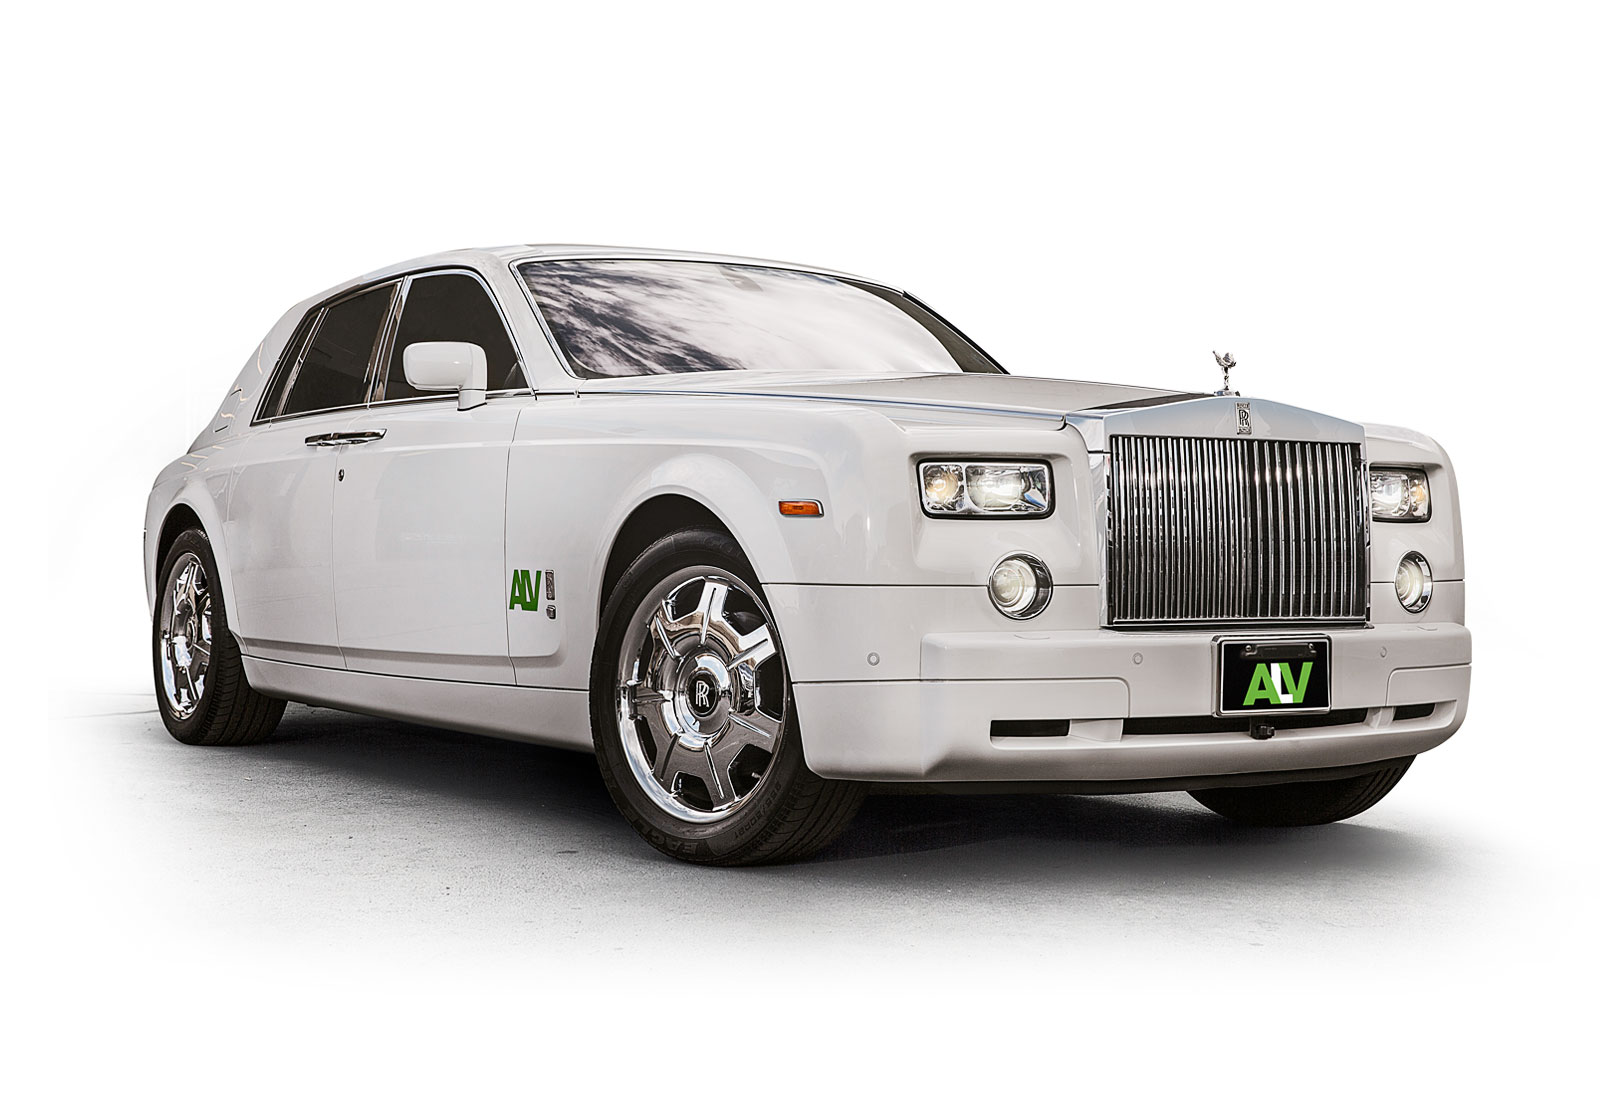 ALV Rolls Royce